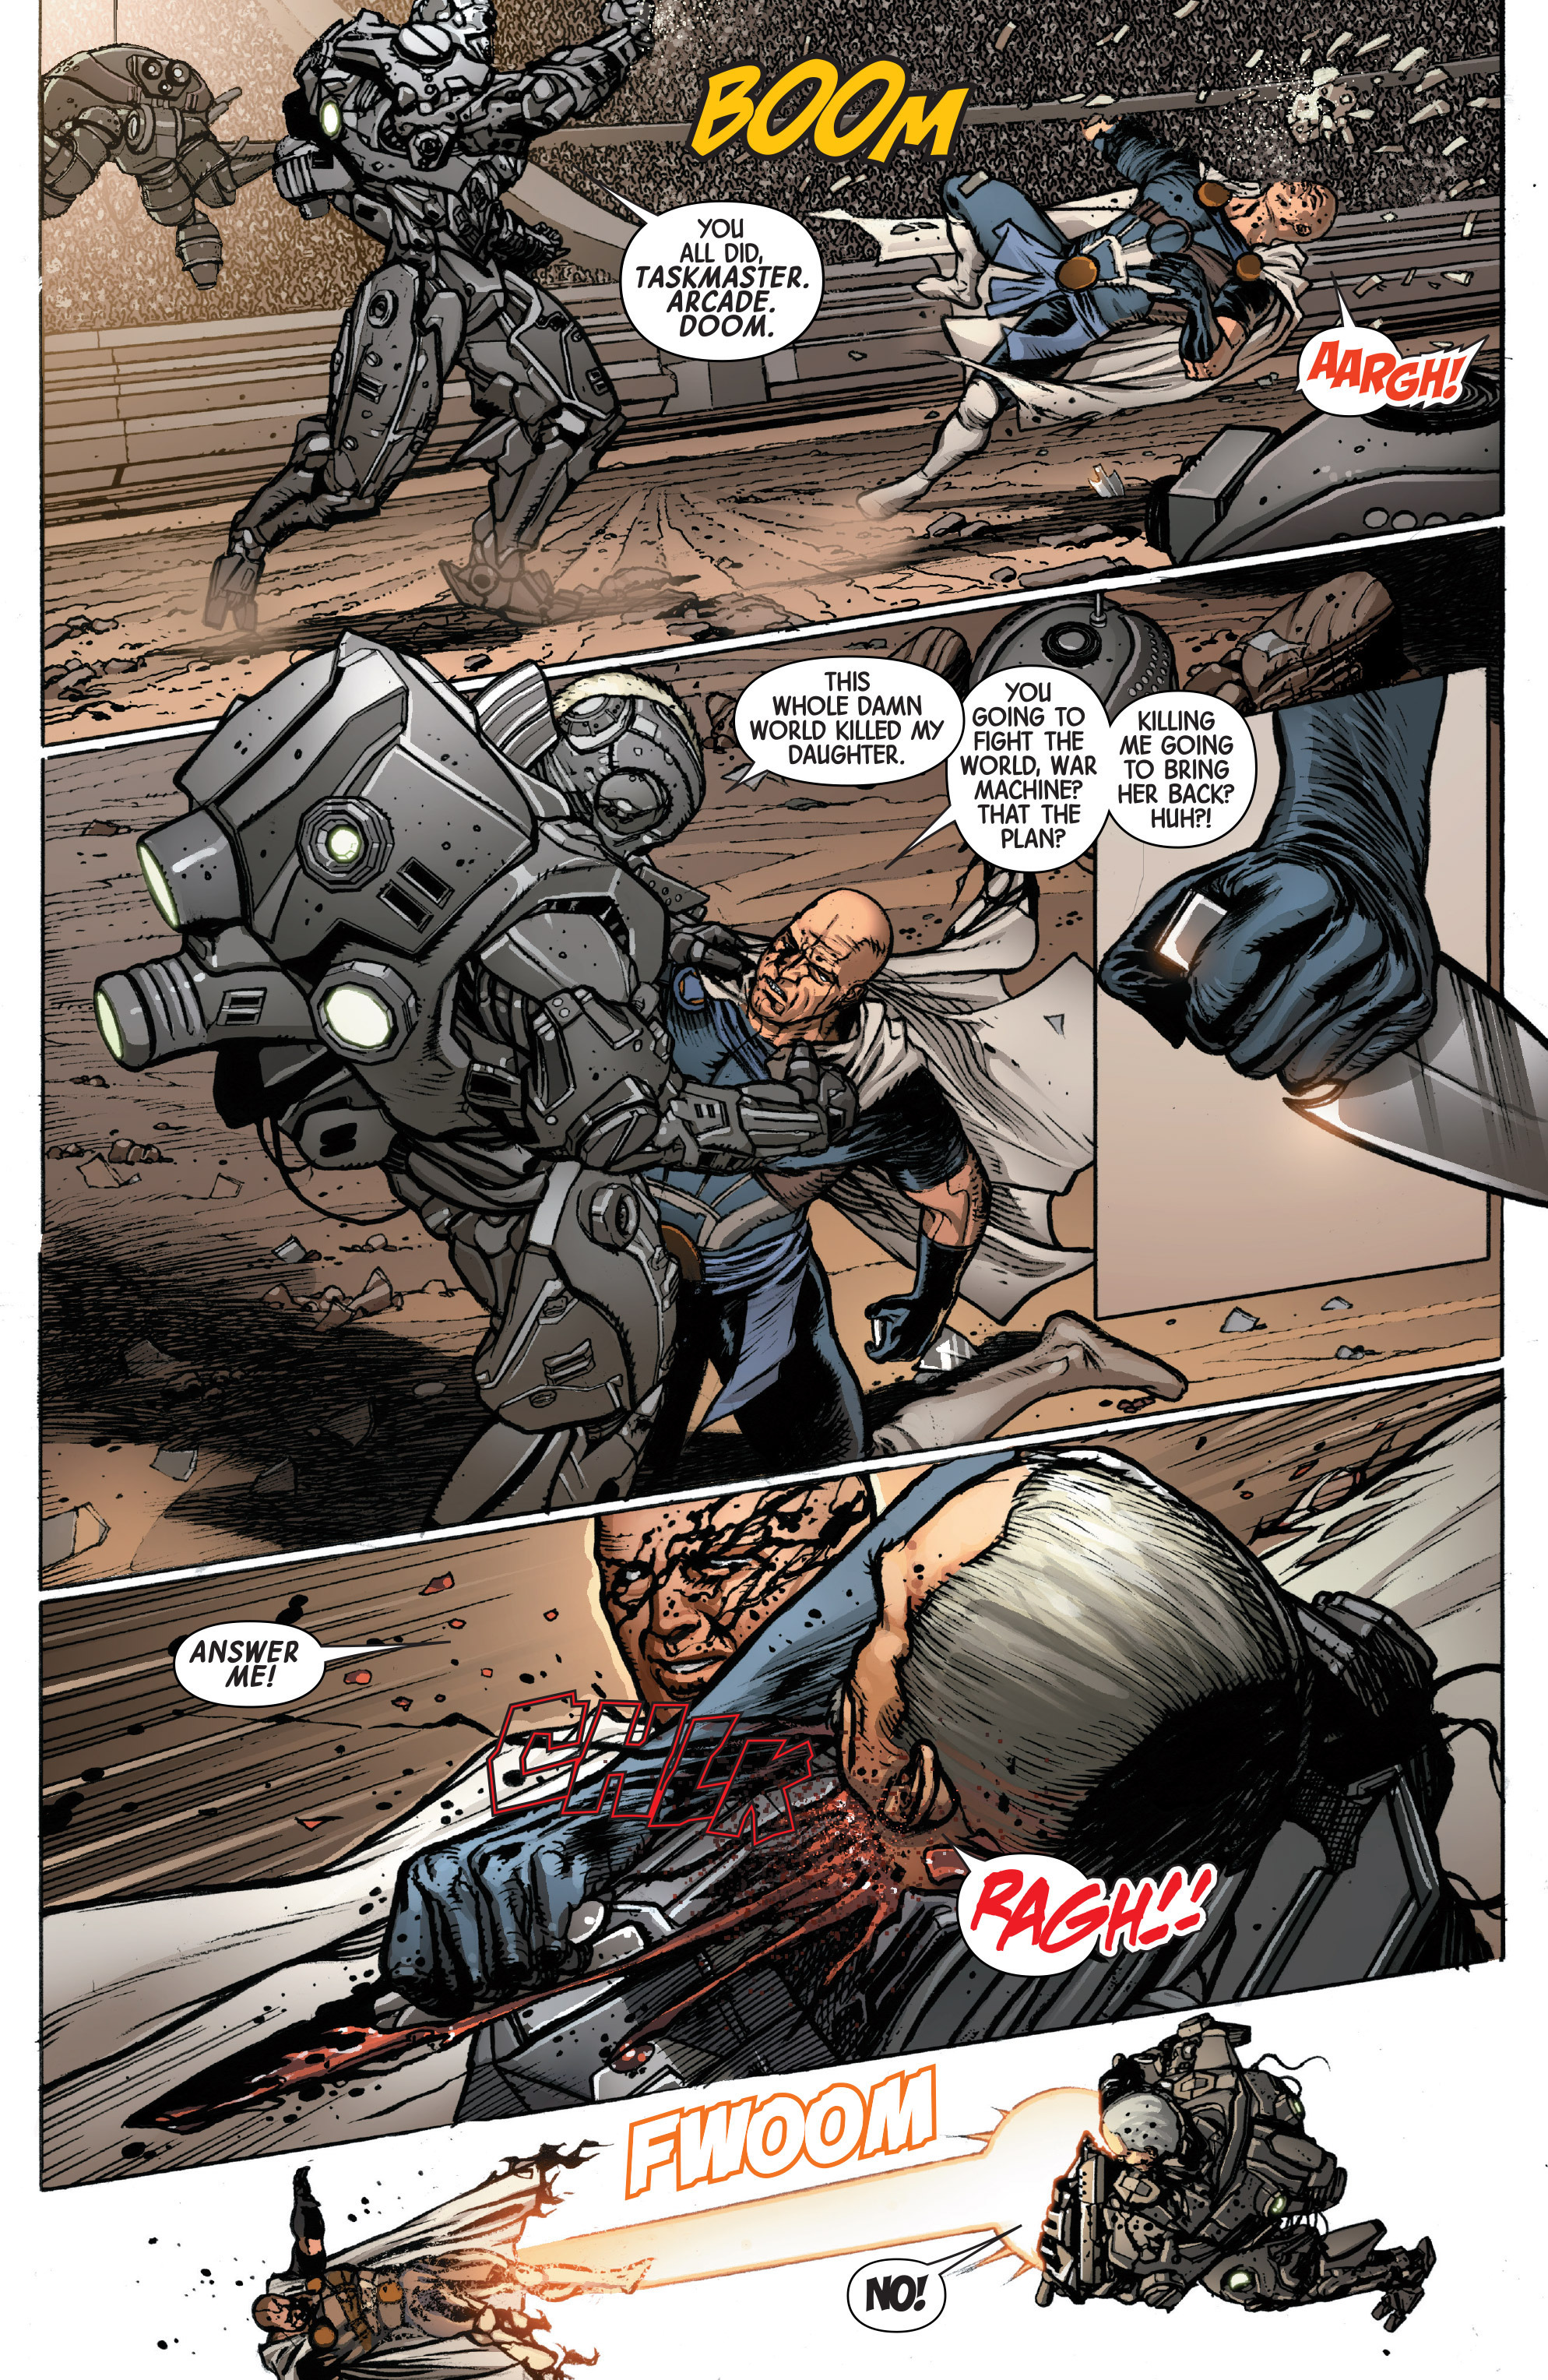 Read online Secret Wars: Battleworld comic -  Issue #2 - 21